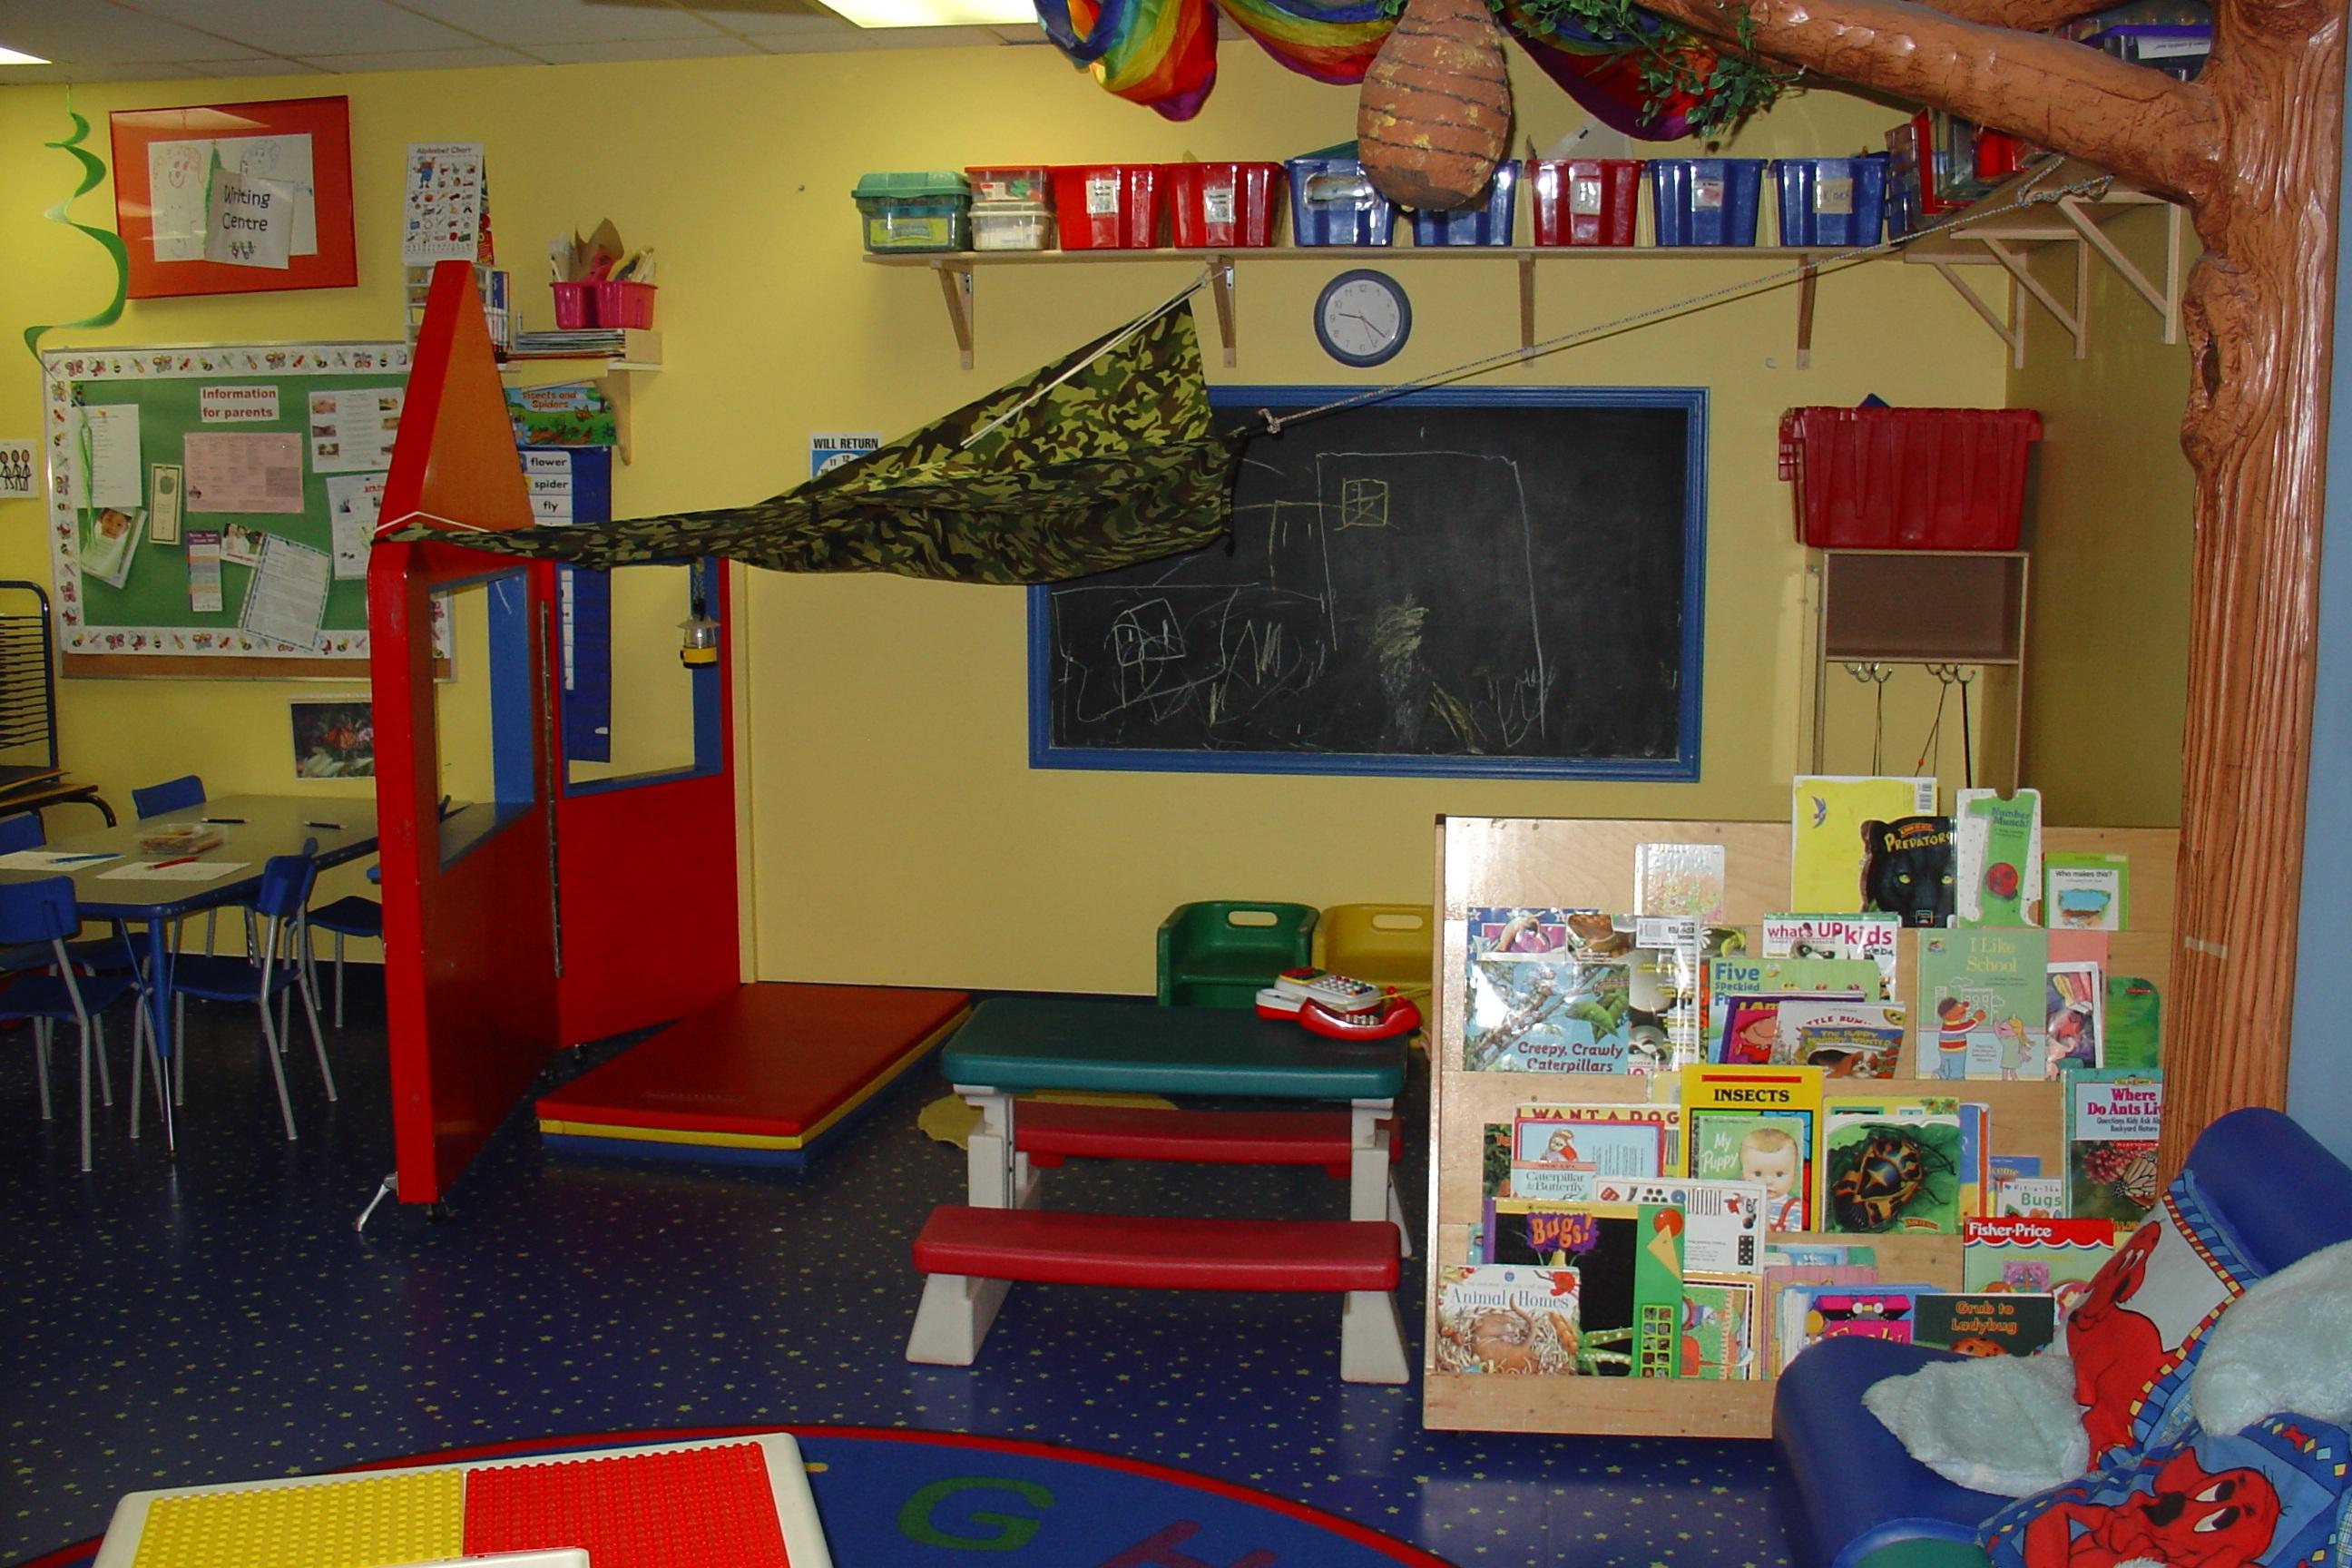 Gambar Mainan Kelas Anak Anak Taman Kanak Kanak Kamar Anak